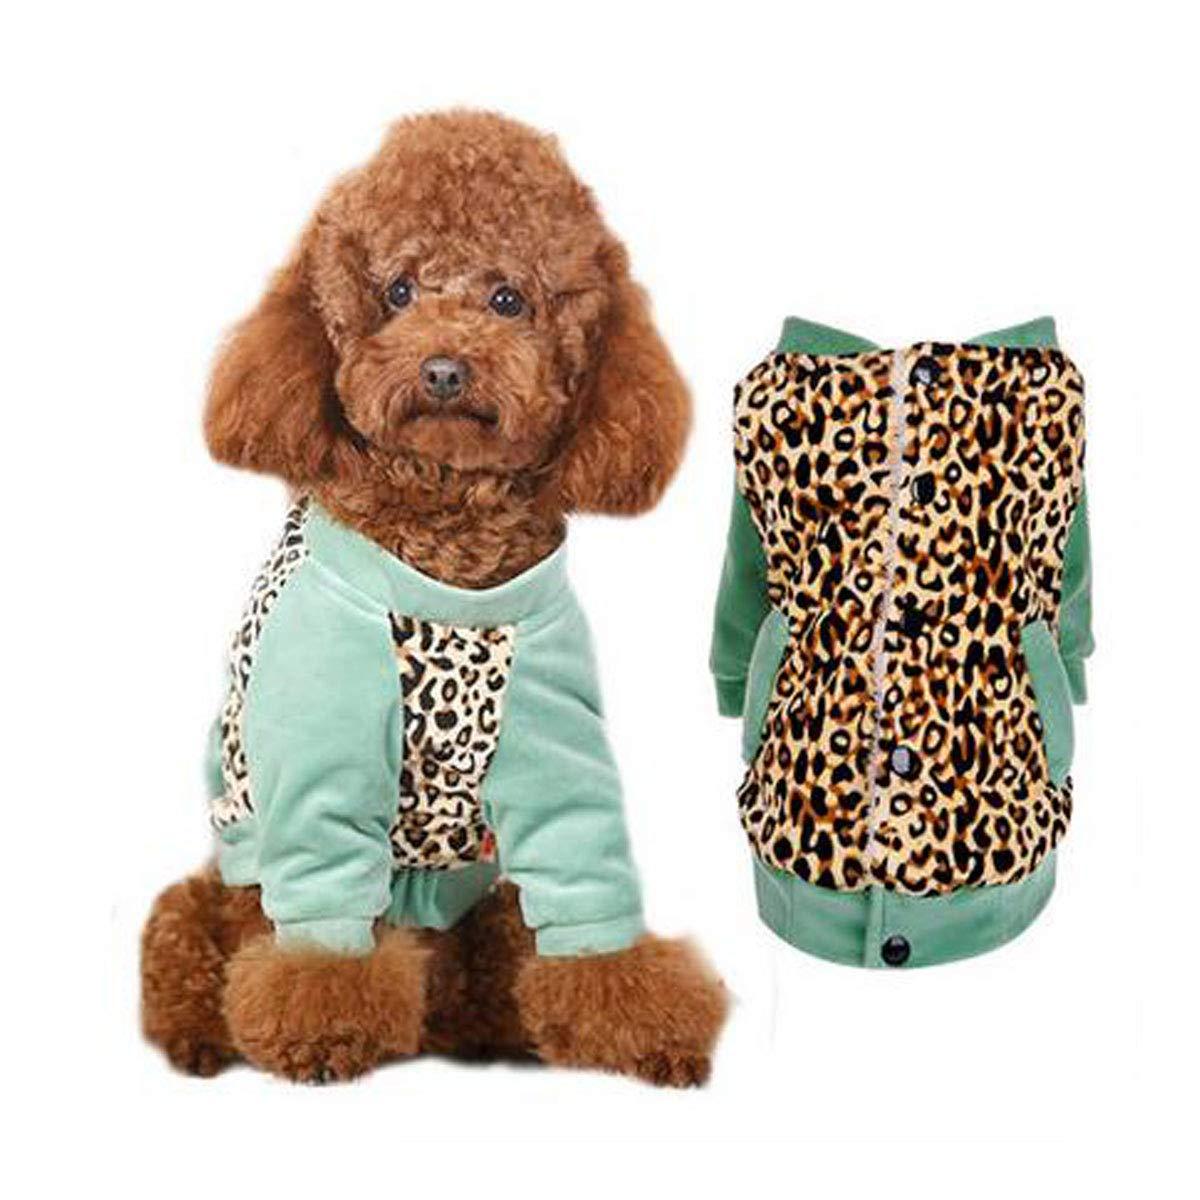 Leopard print L Leopard print L Autumn and Winter Clothes for pet Puppies (color   Leopard Print, Size   L)